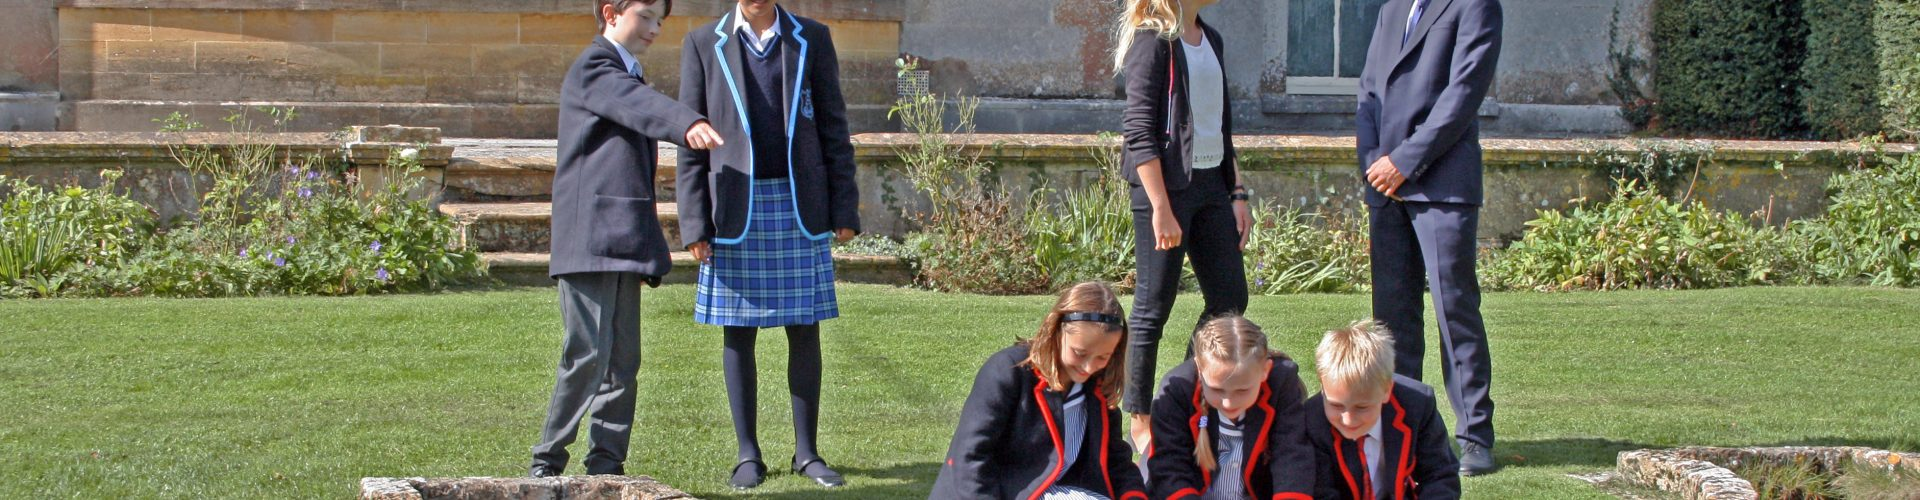 Leweston School Students